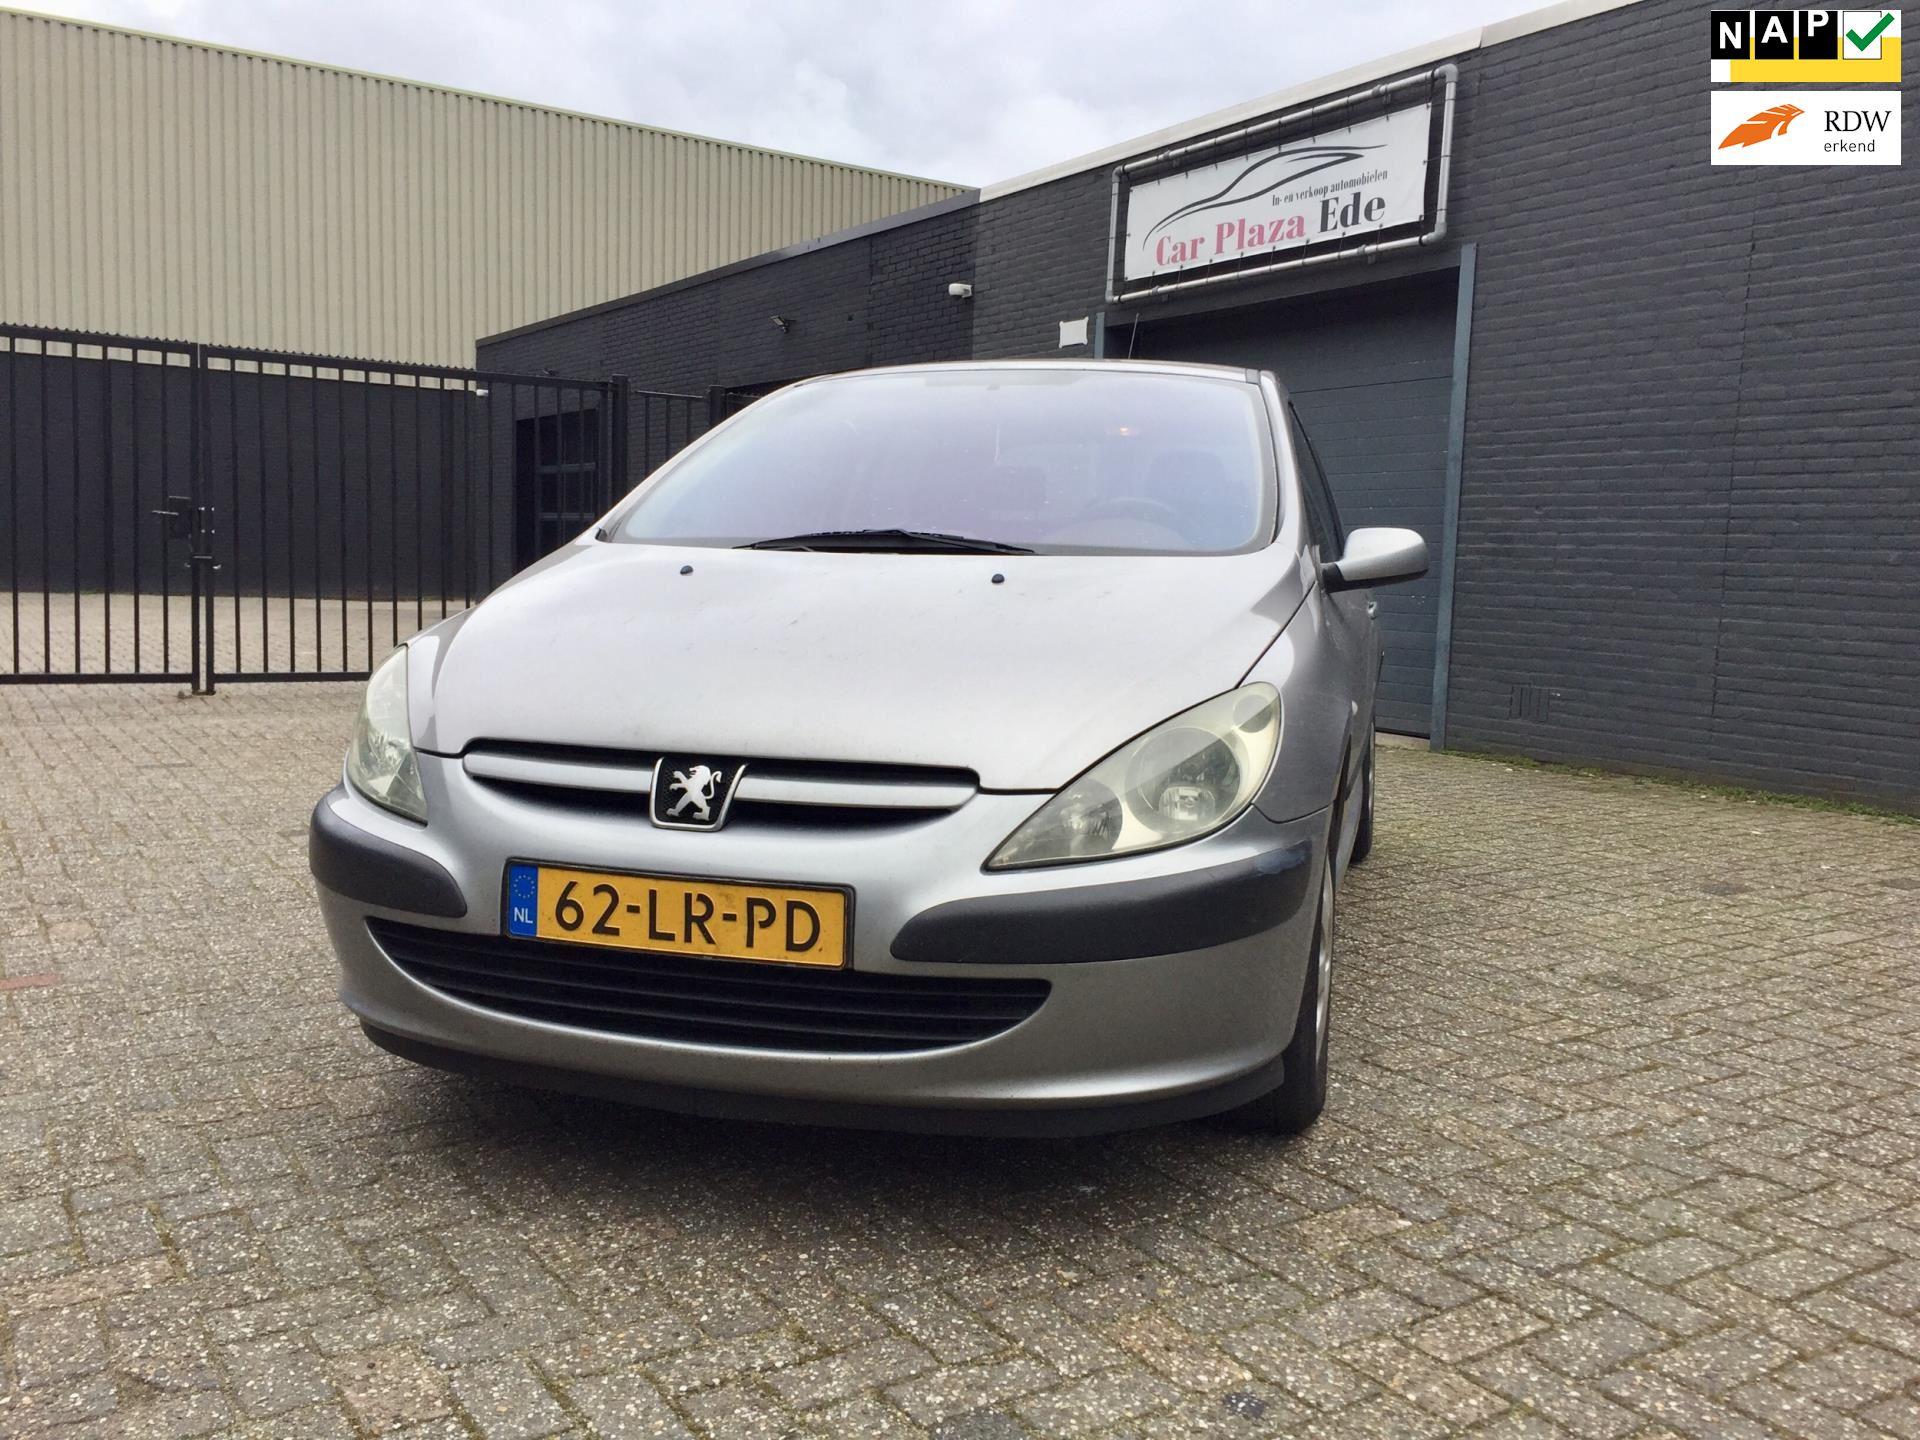 Peugeot 307 occasion - Carplaza Ede